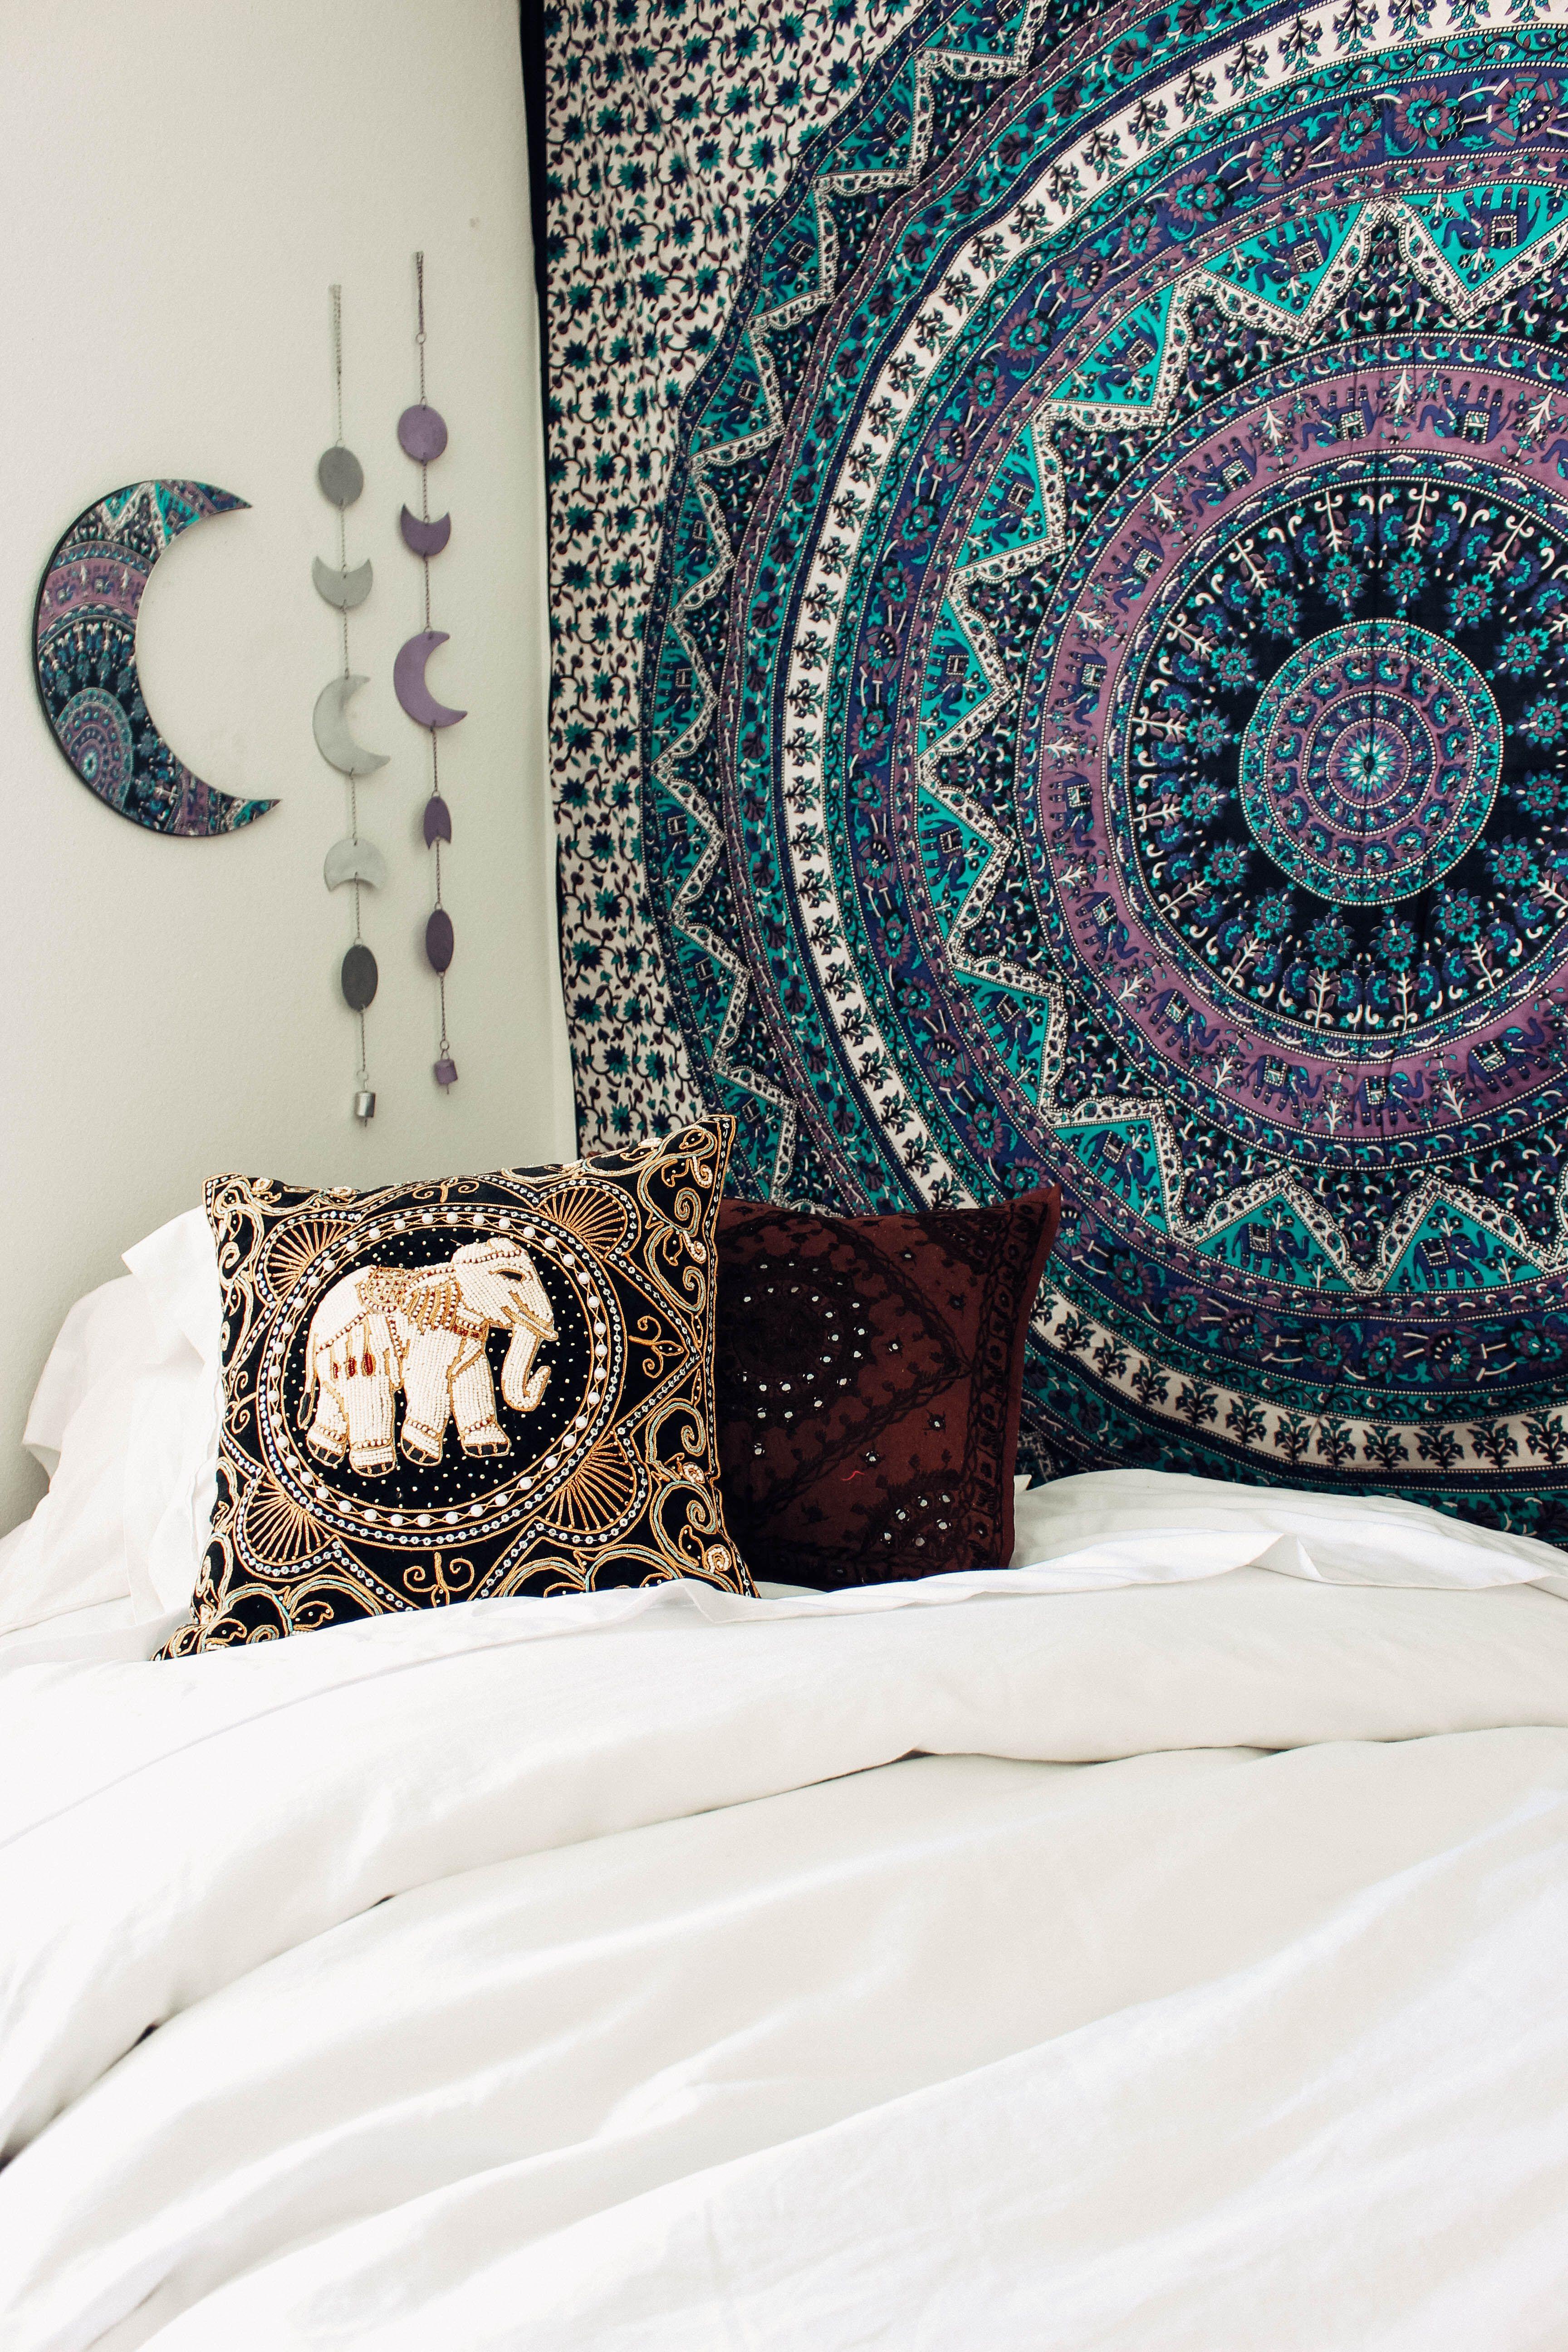 Voodoo Dreams Tapestry Design by kaitlynjohnsondesign